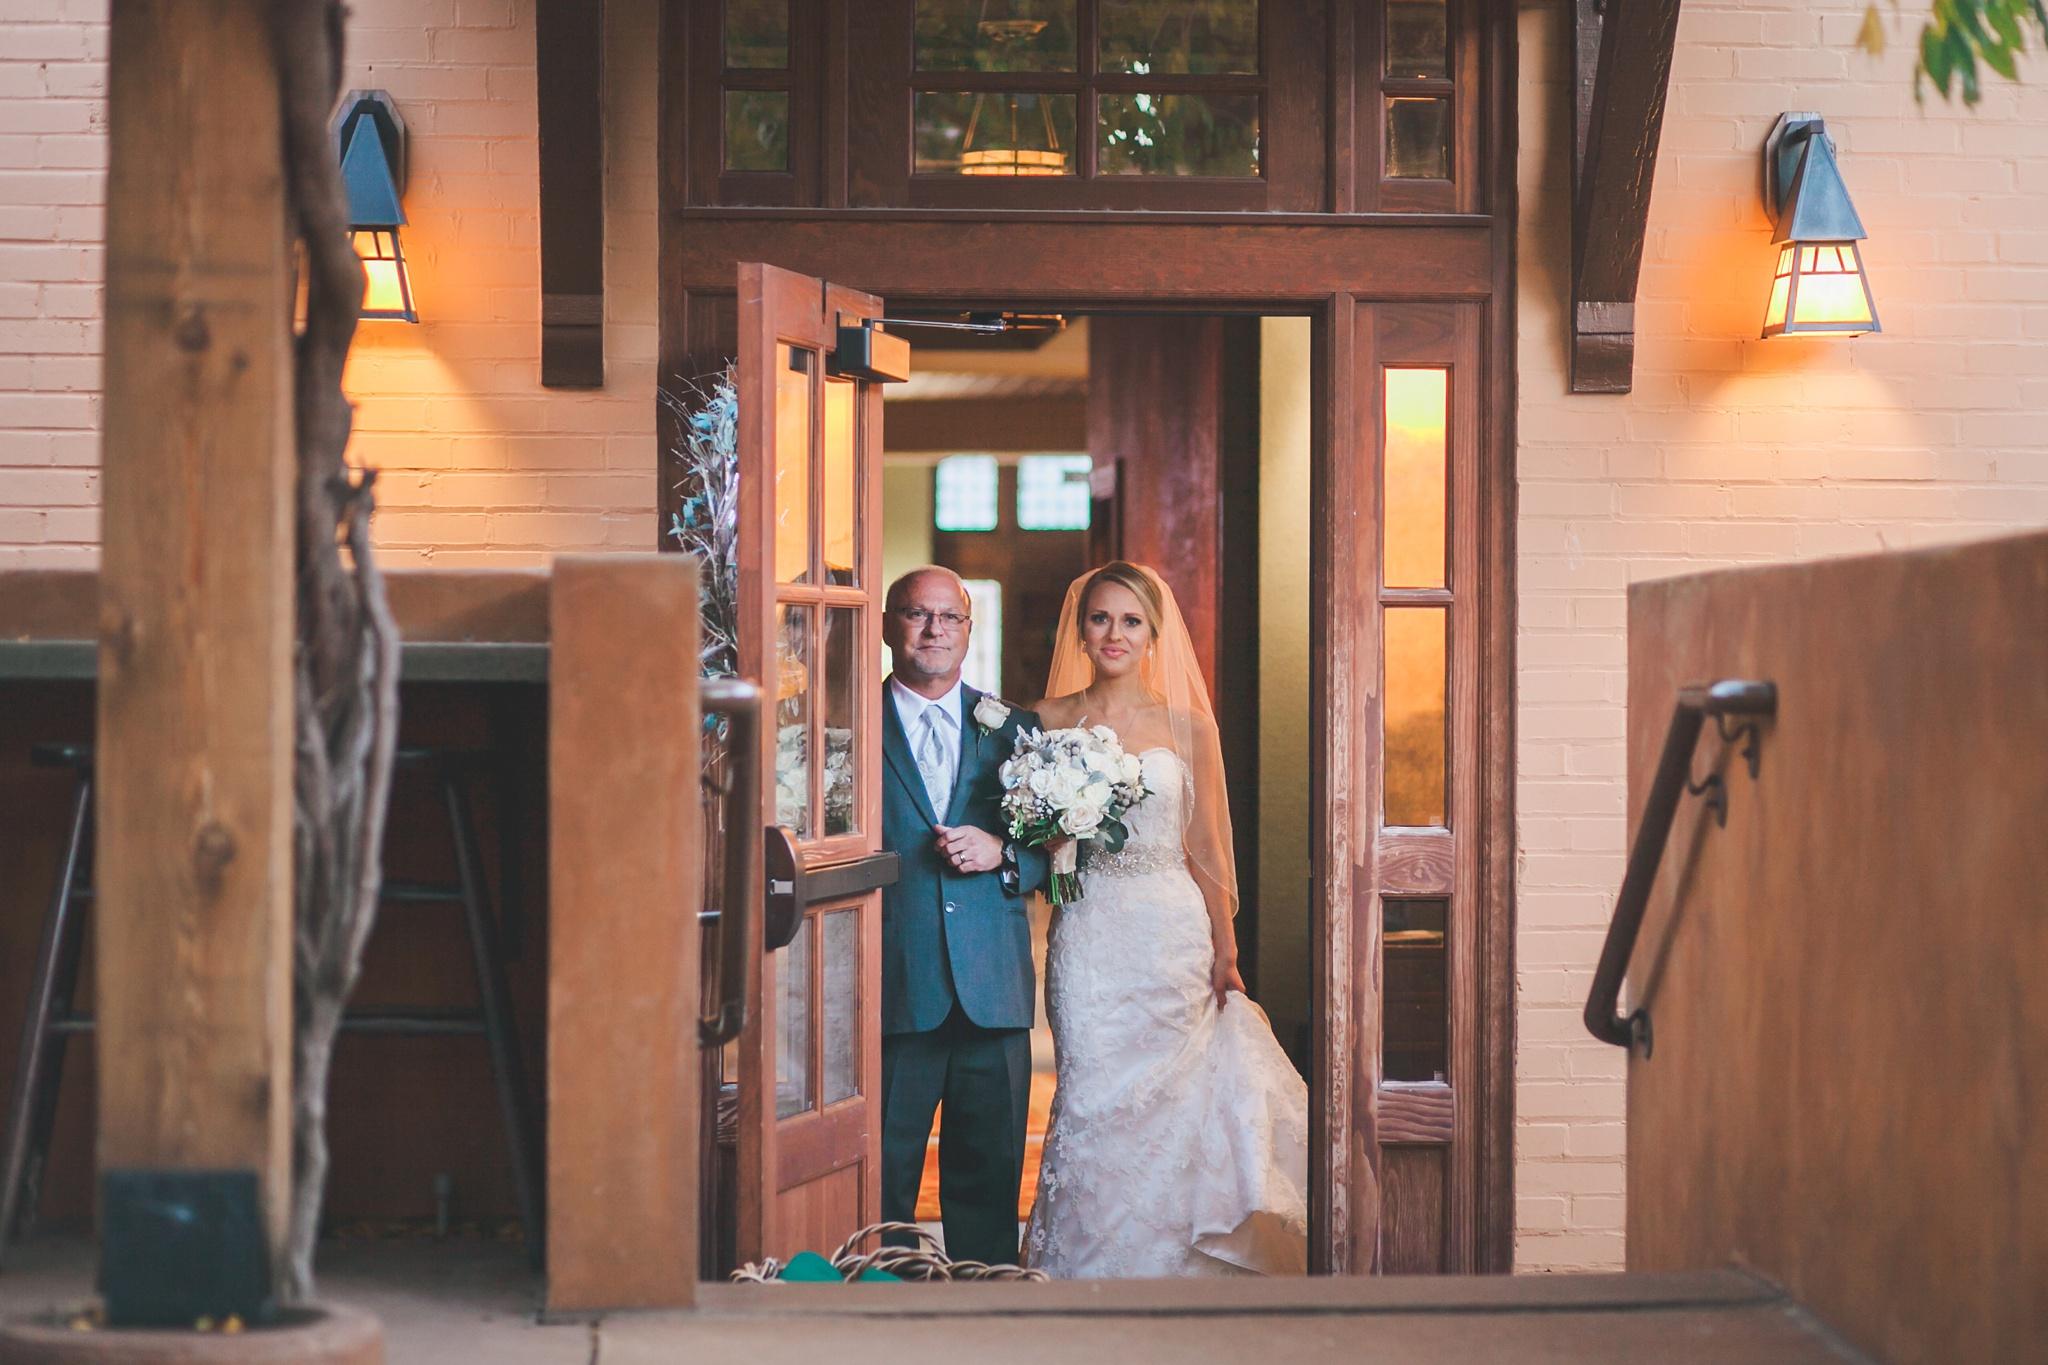 St. Louis Wedding Photographer   Chandler Rose Photography_0046.jpg